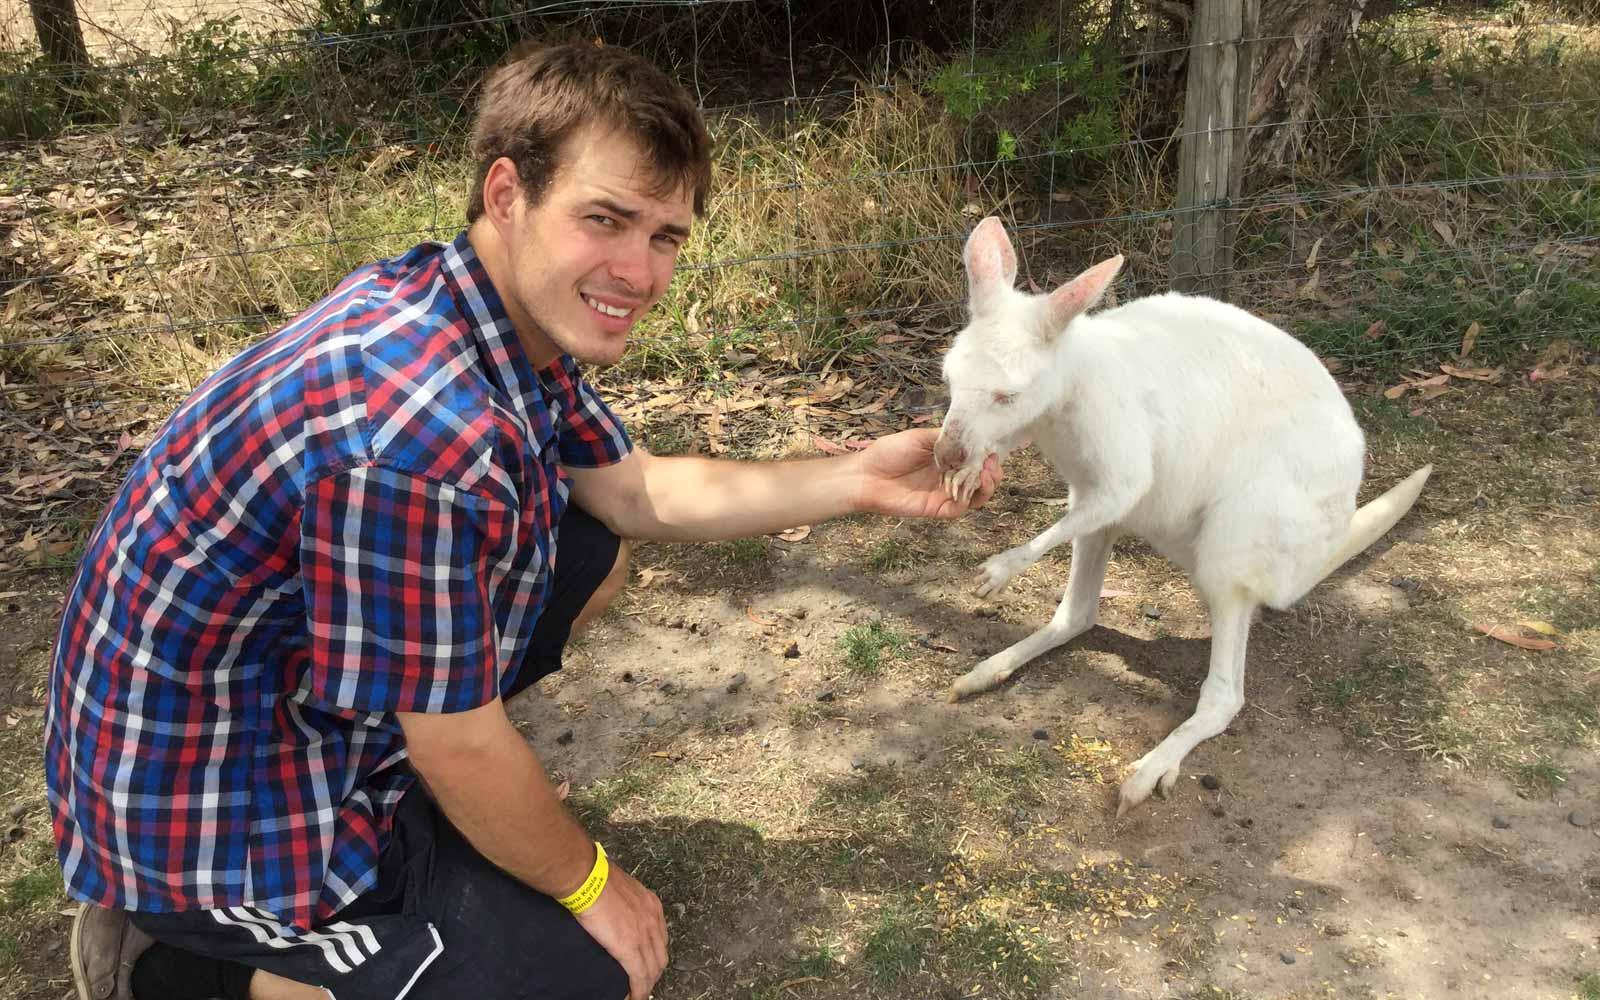 Justin mit weißem Känguru